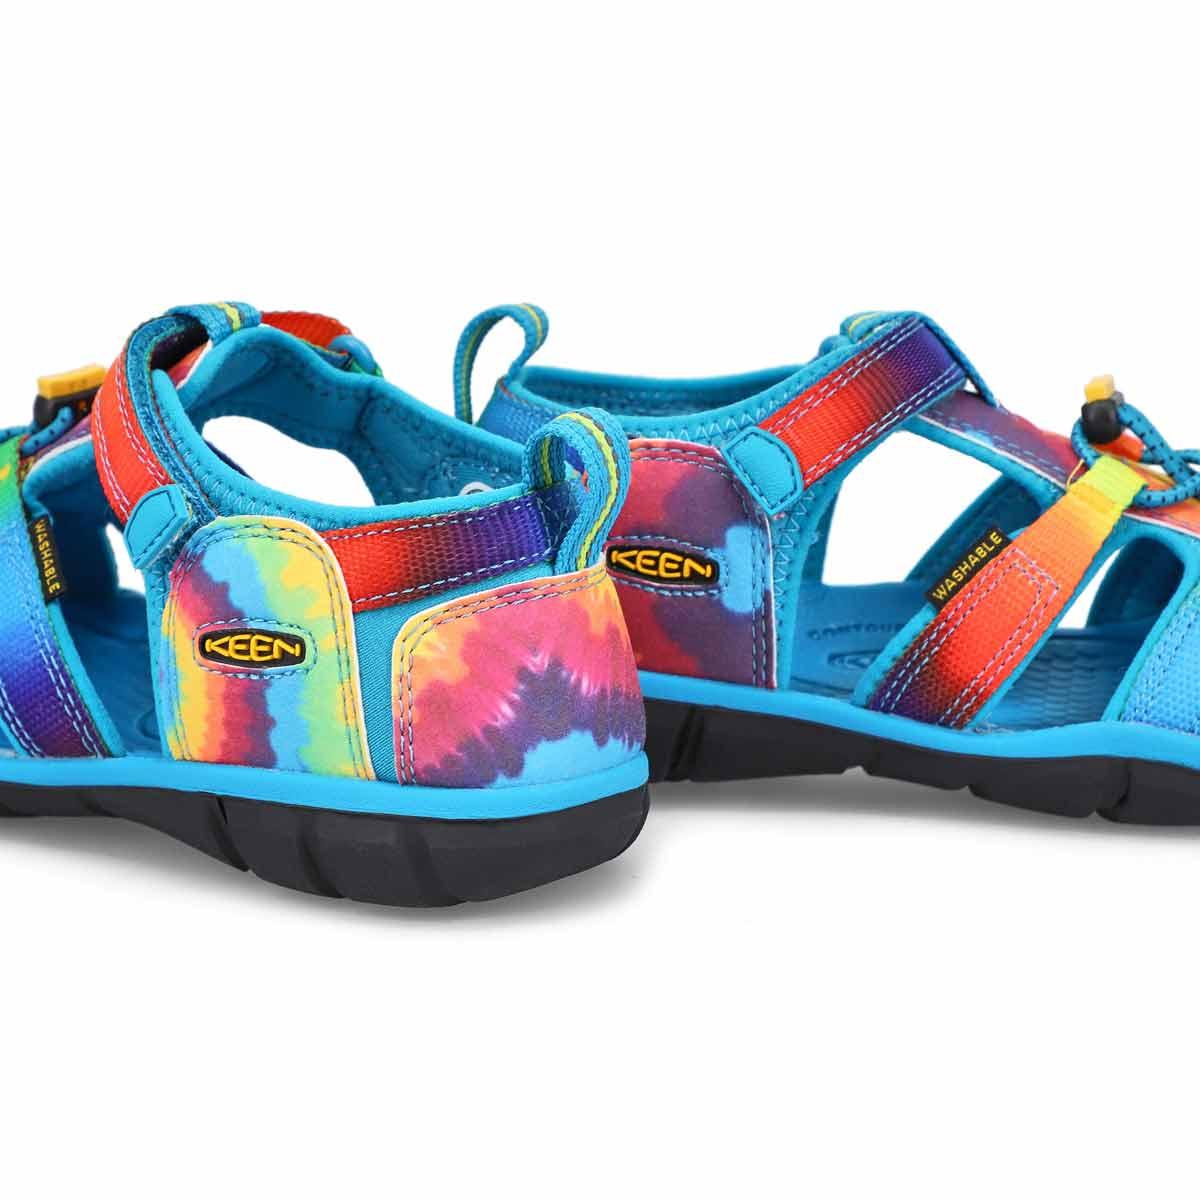 Girls' Seacamp II CNX Sandal - Blue/Tie Dye